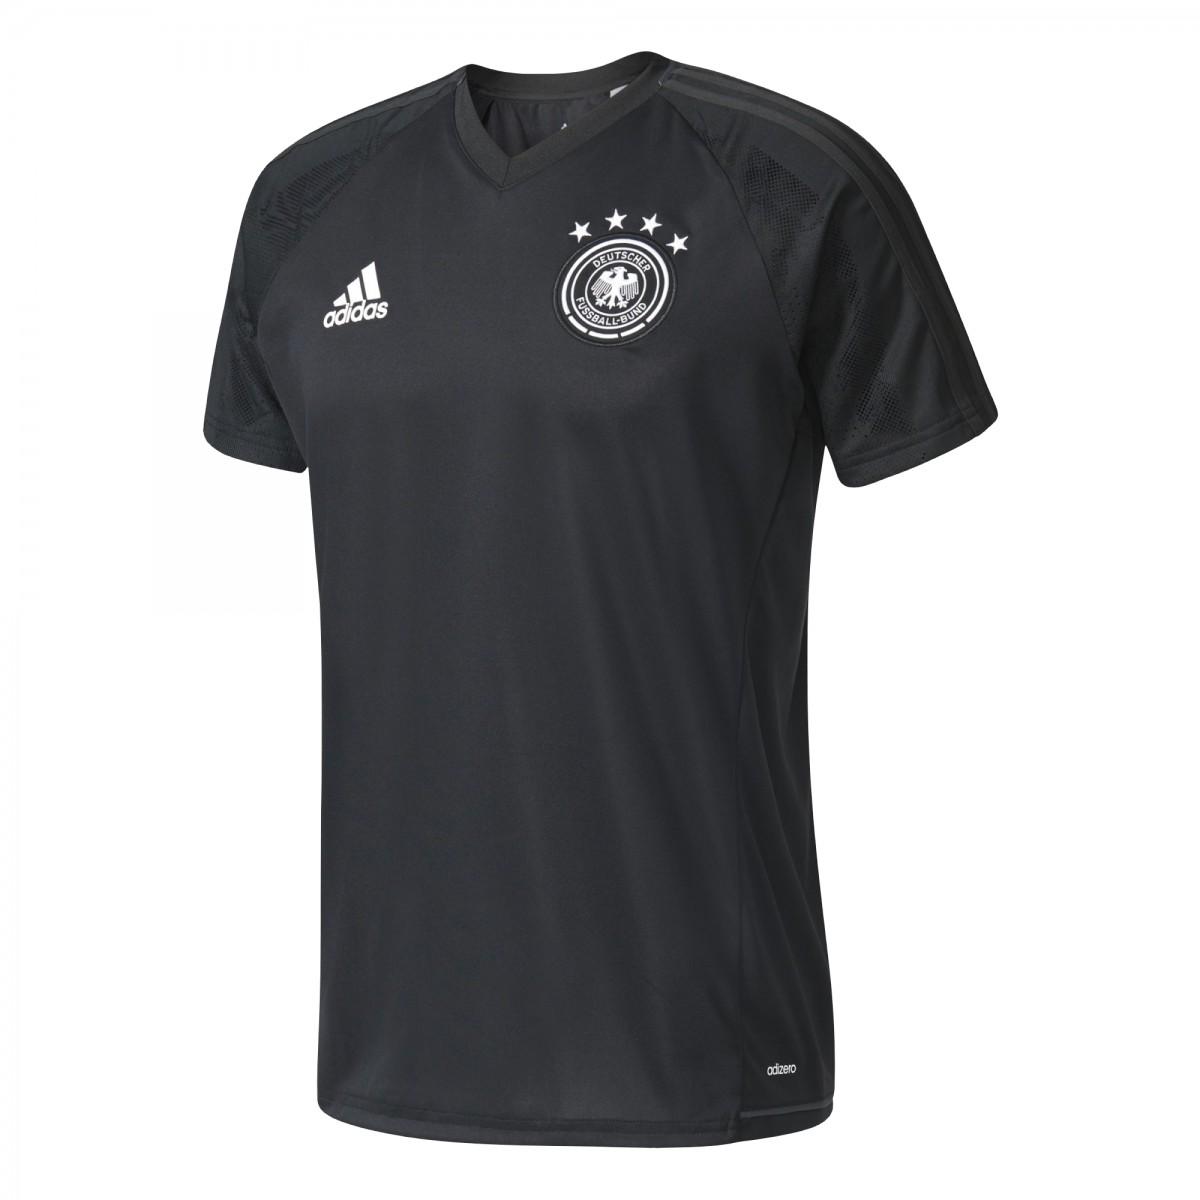 55226c464b444 Camisa Adidas Treino Alemanha